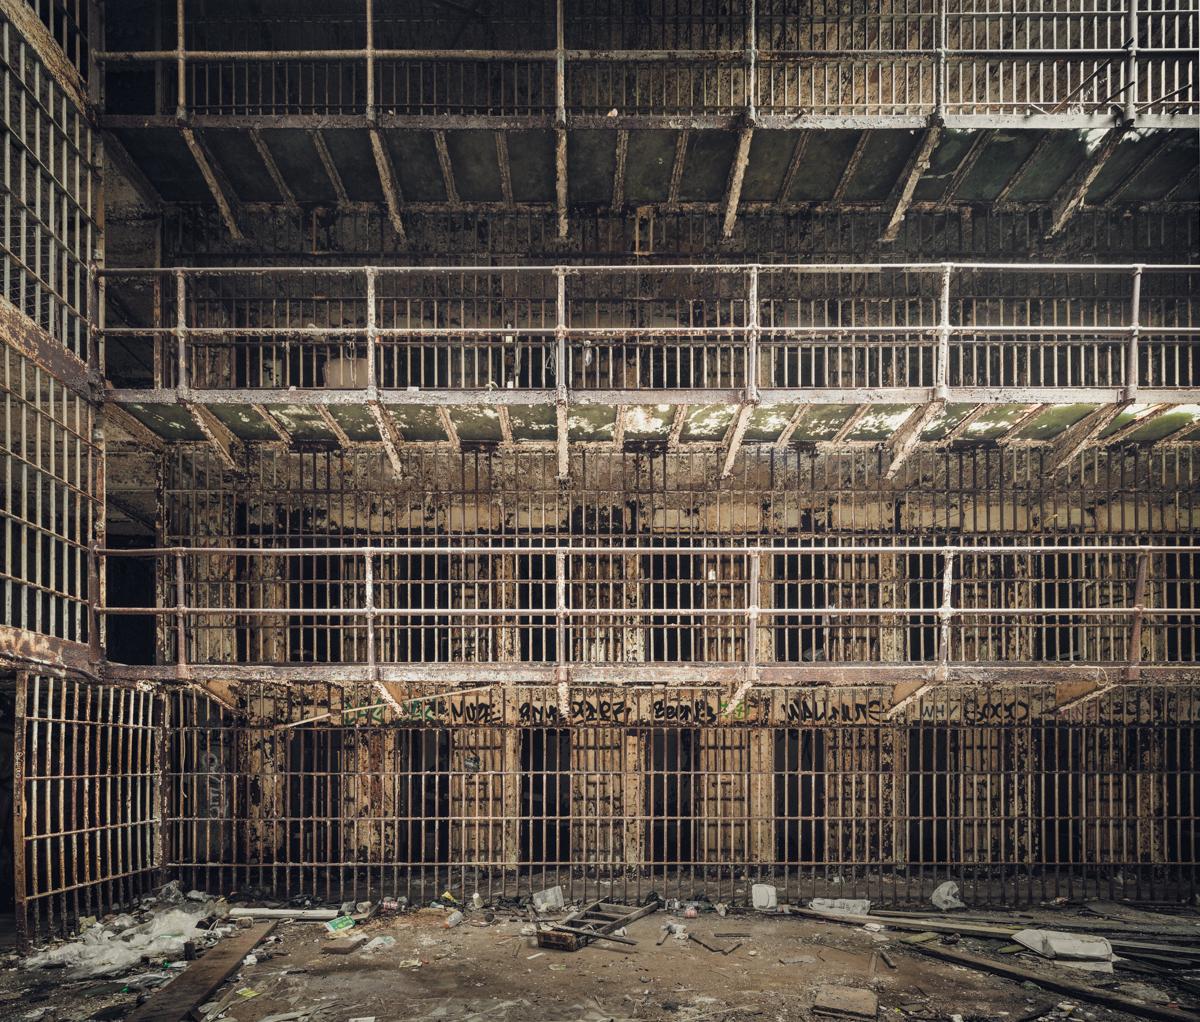 Essex county jail newark n j Nude Photos 34